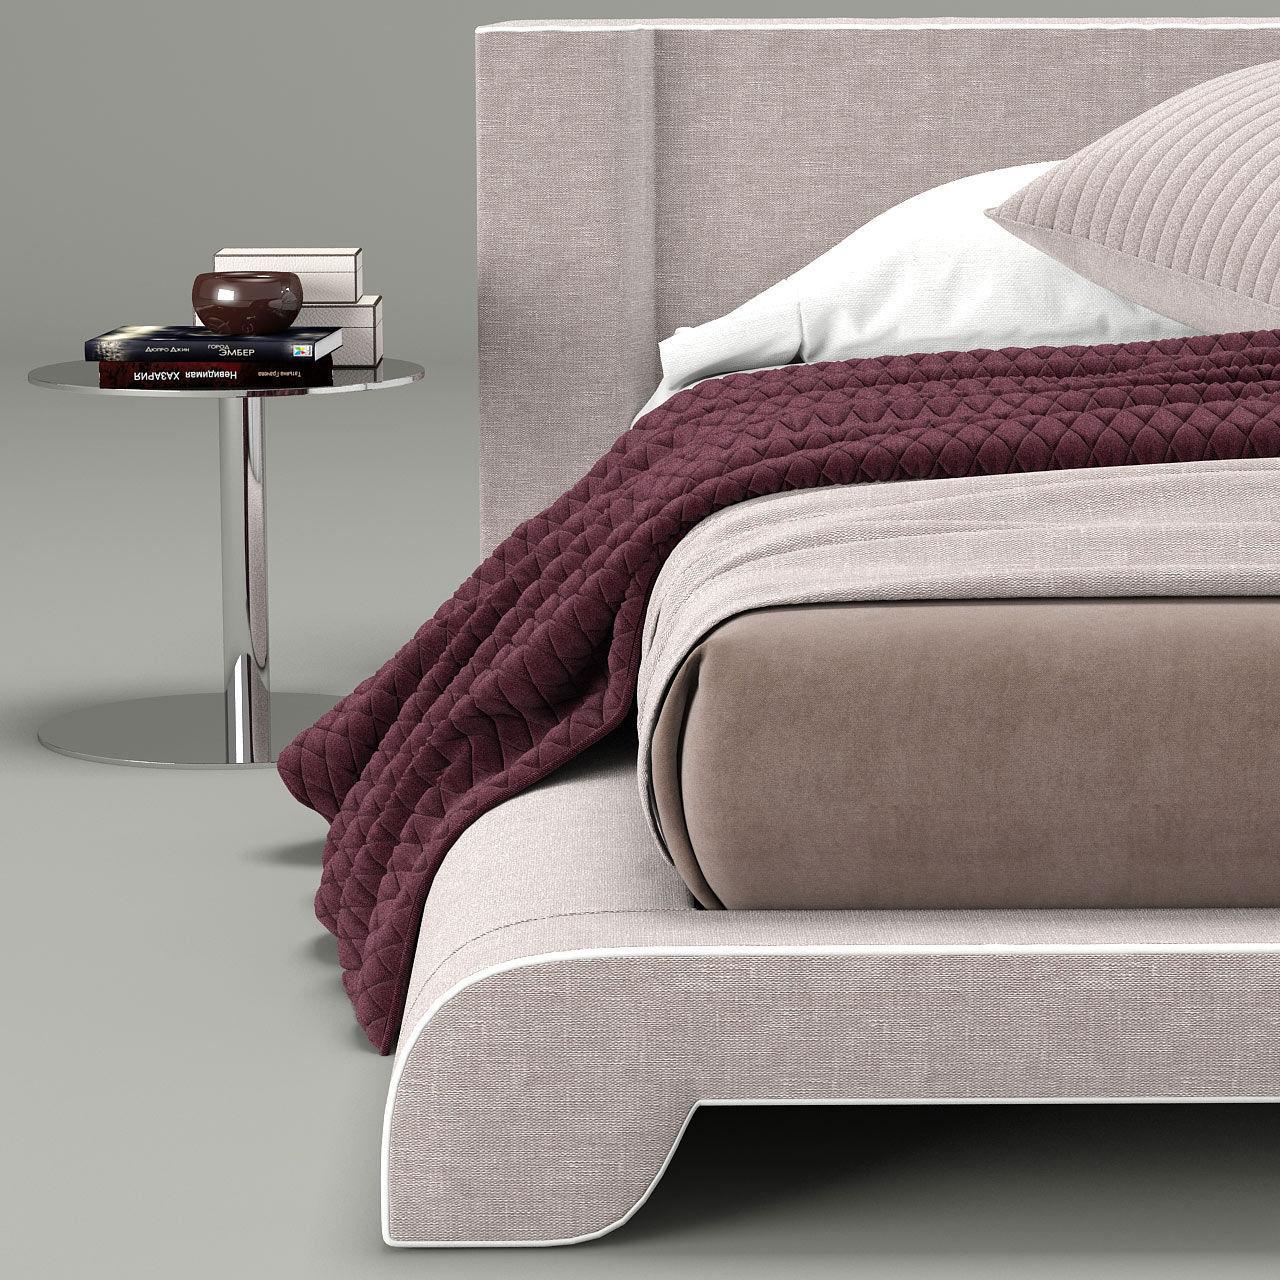 desiree furniture. Desiree Isabell Bed 3d Model Max Obj Fbx Mtl 3 Furniture